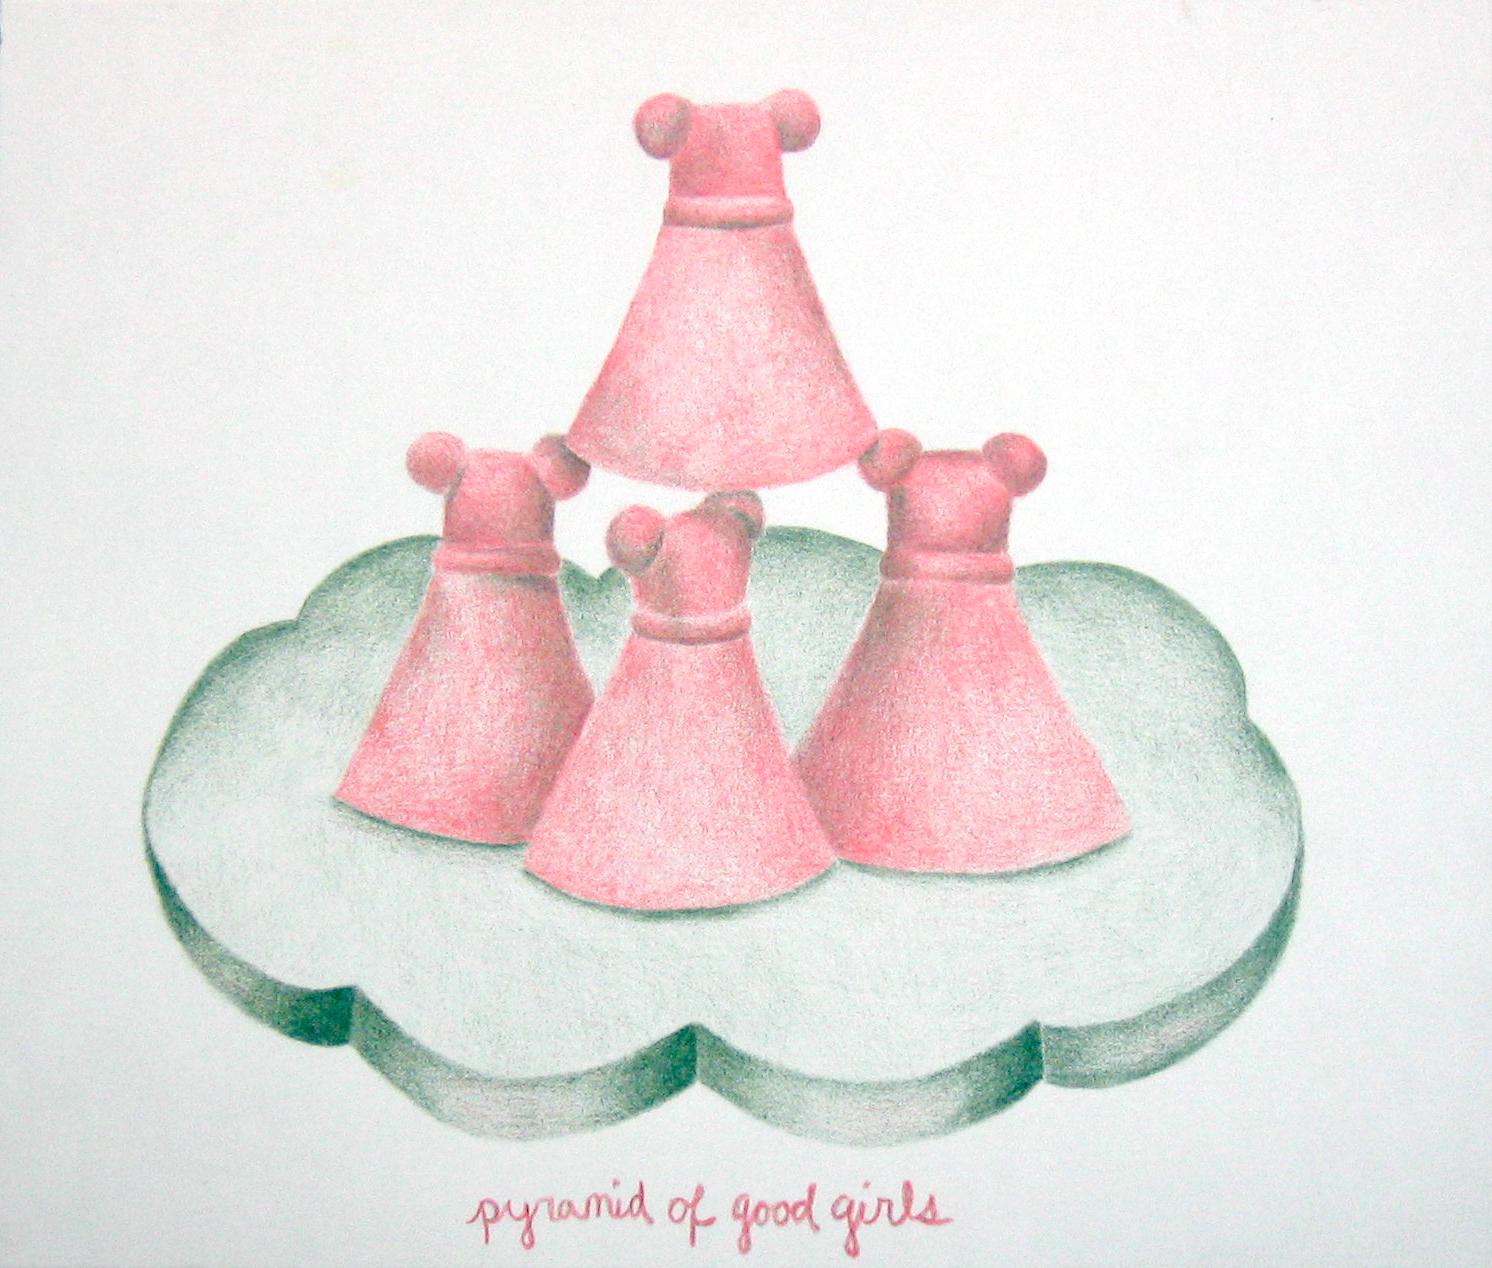 Pyramid of Good Girls